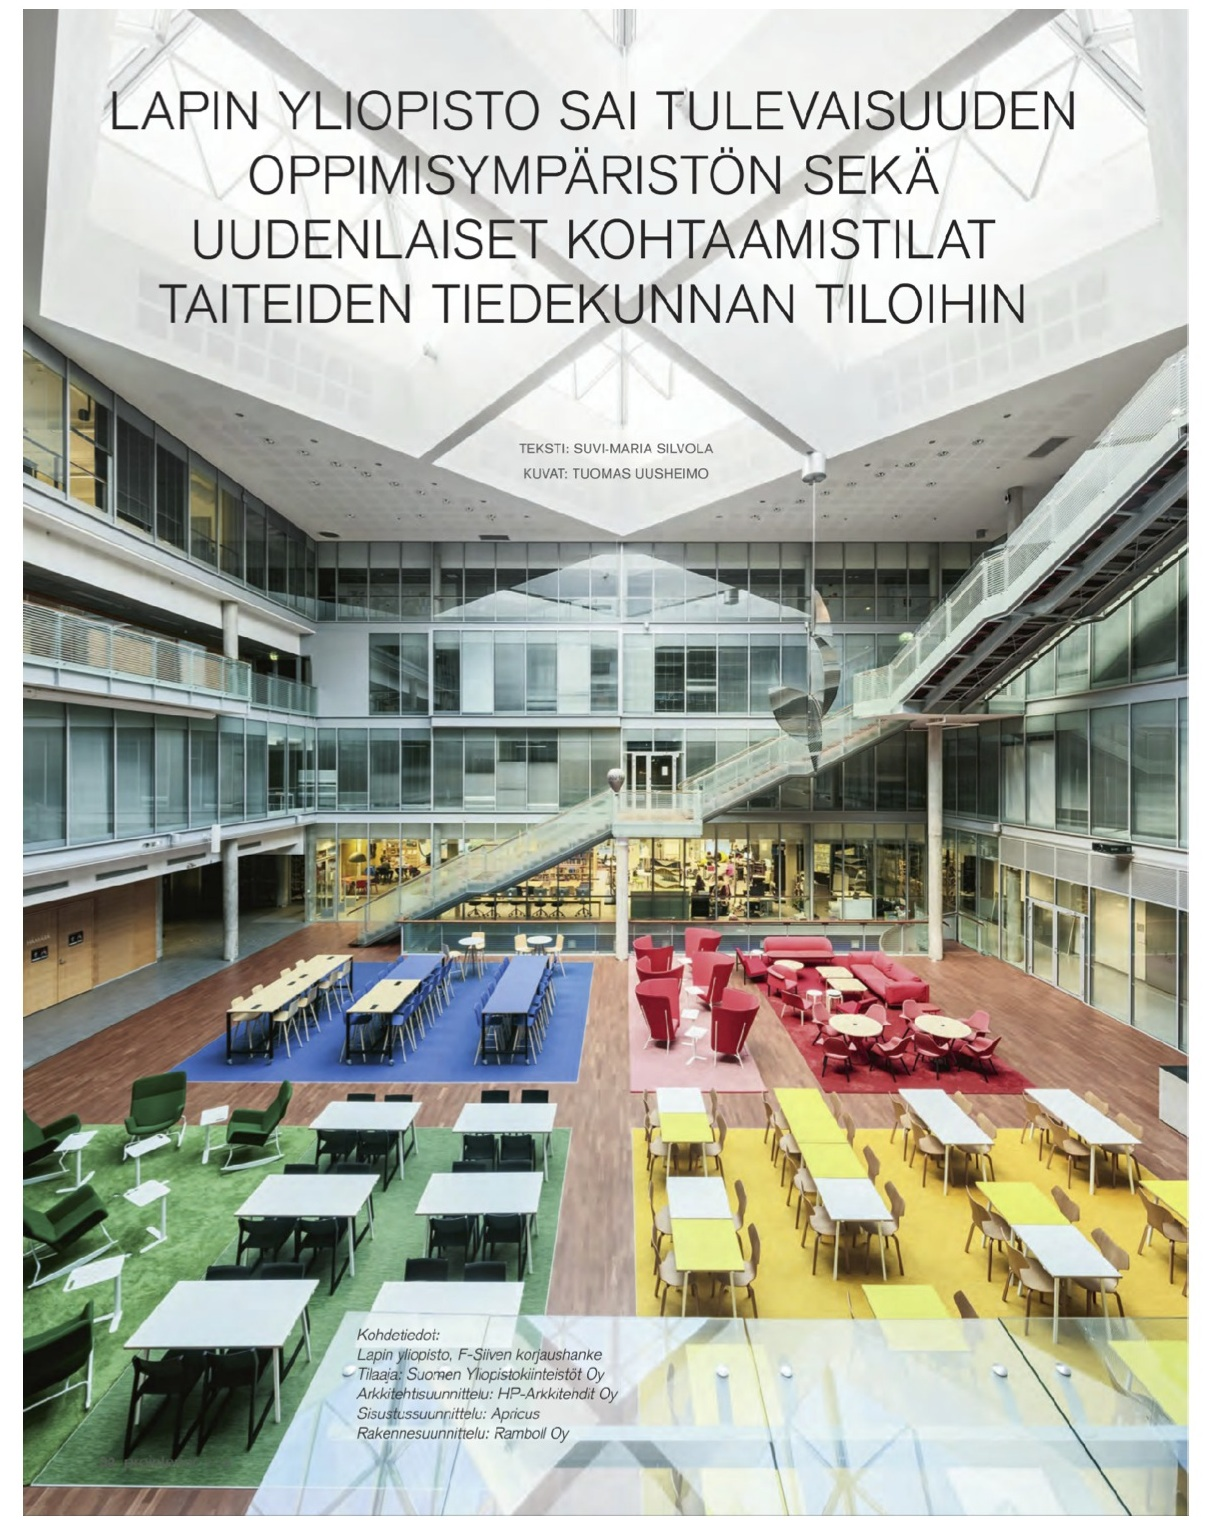 University-of-lapland-interior2